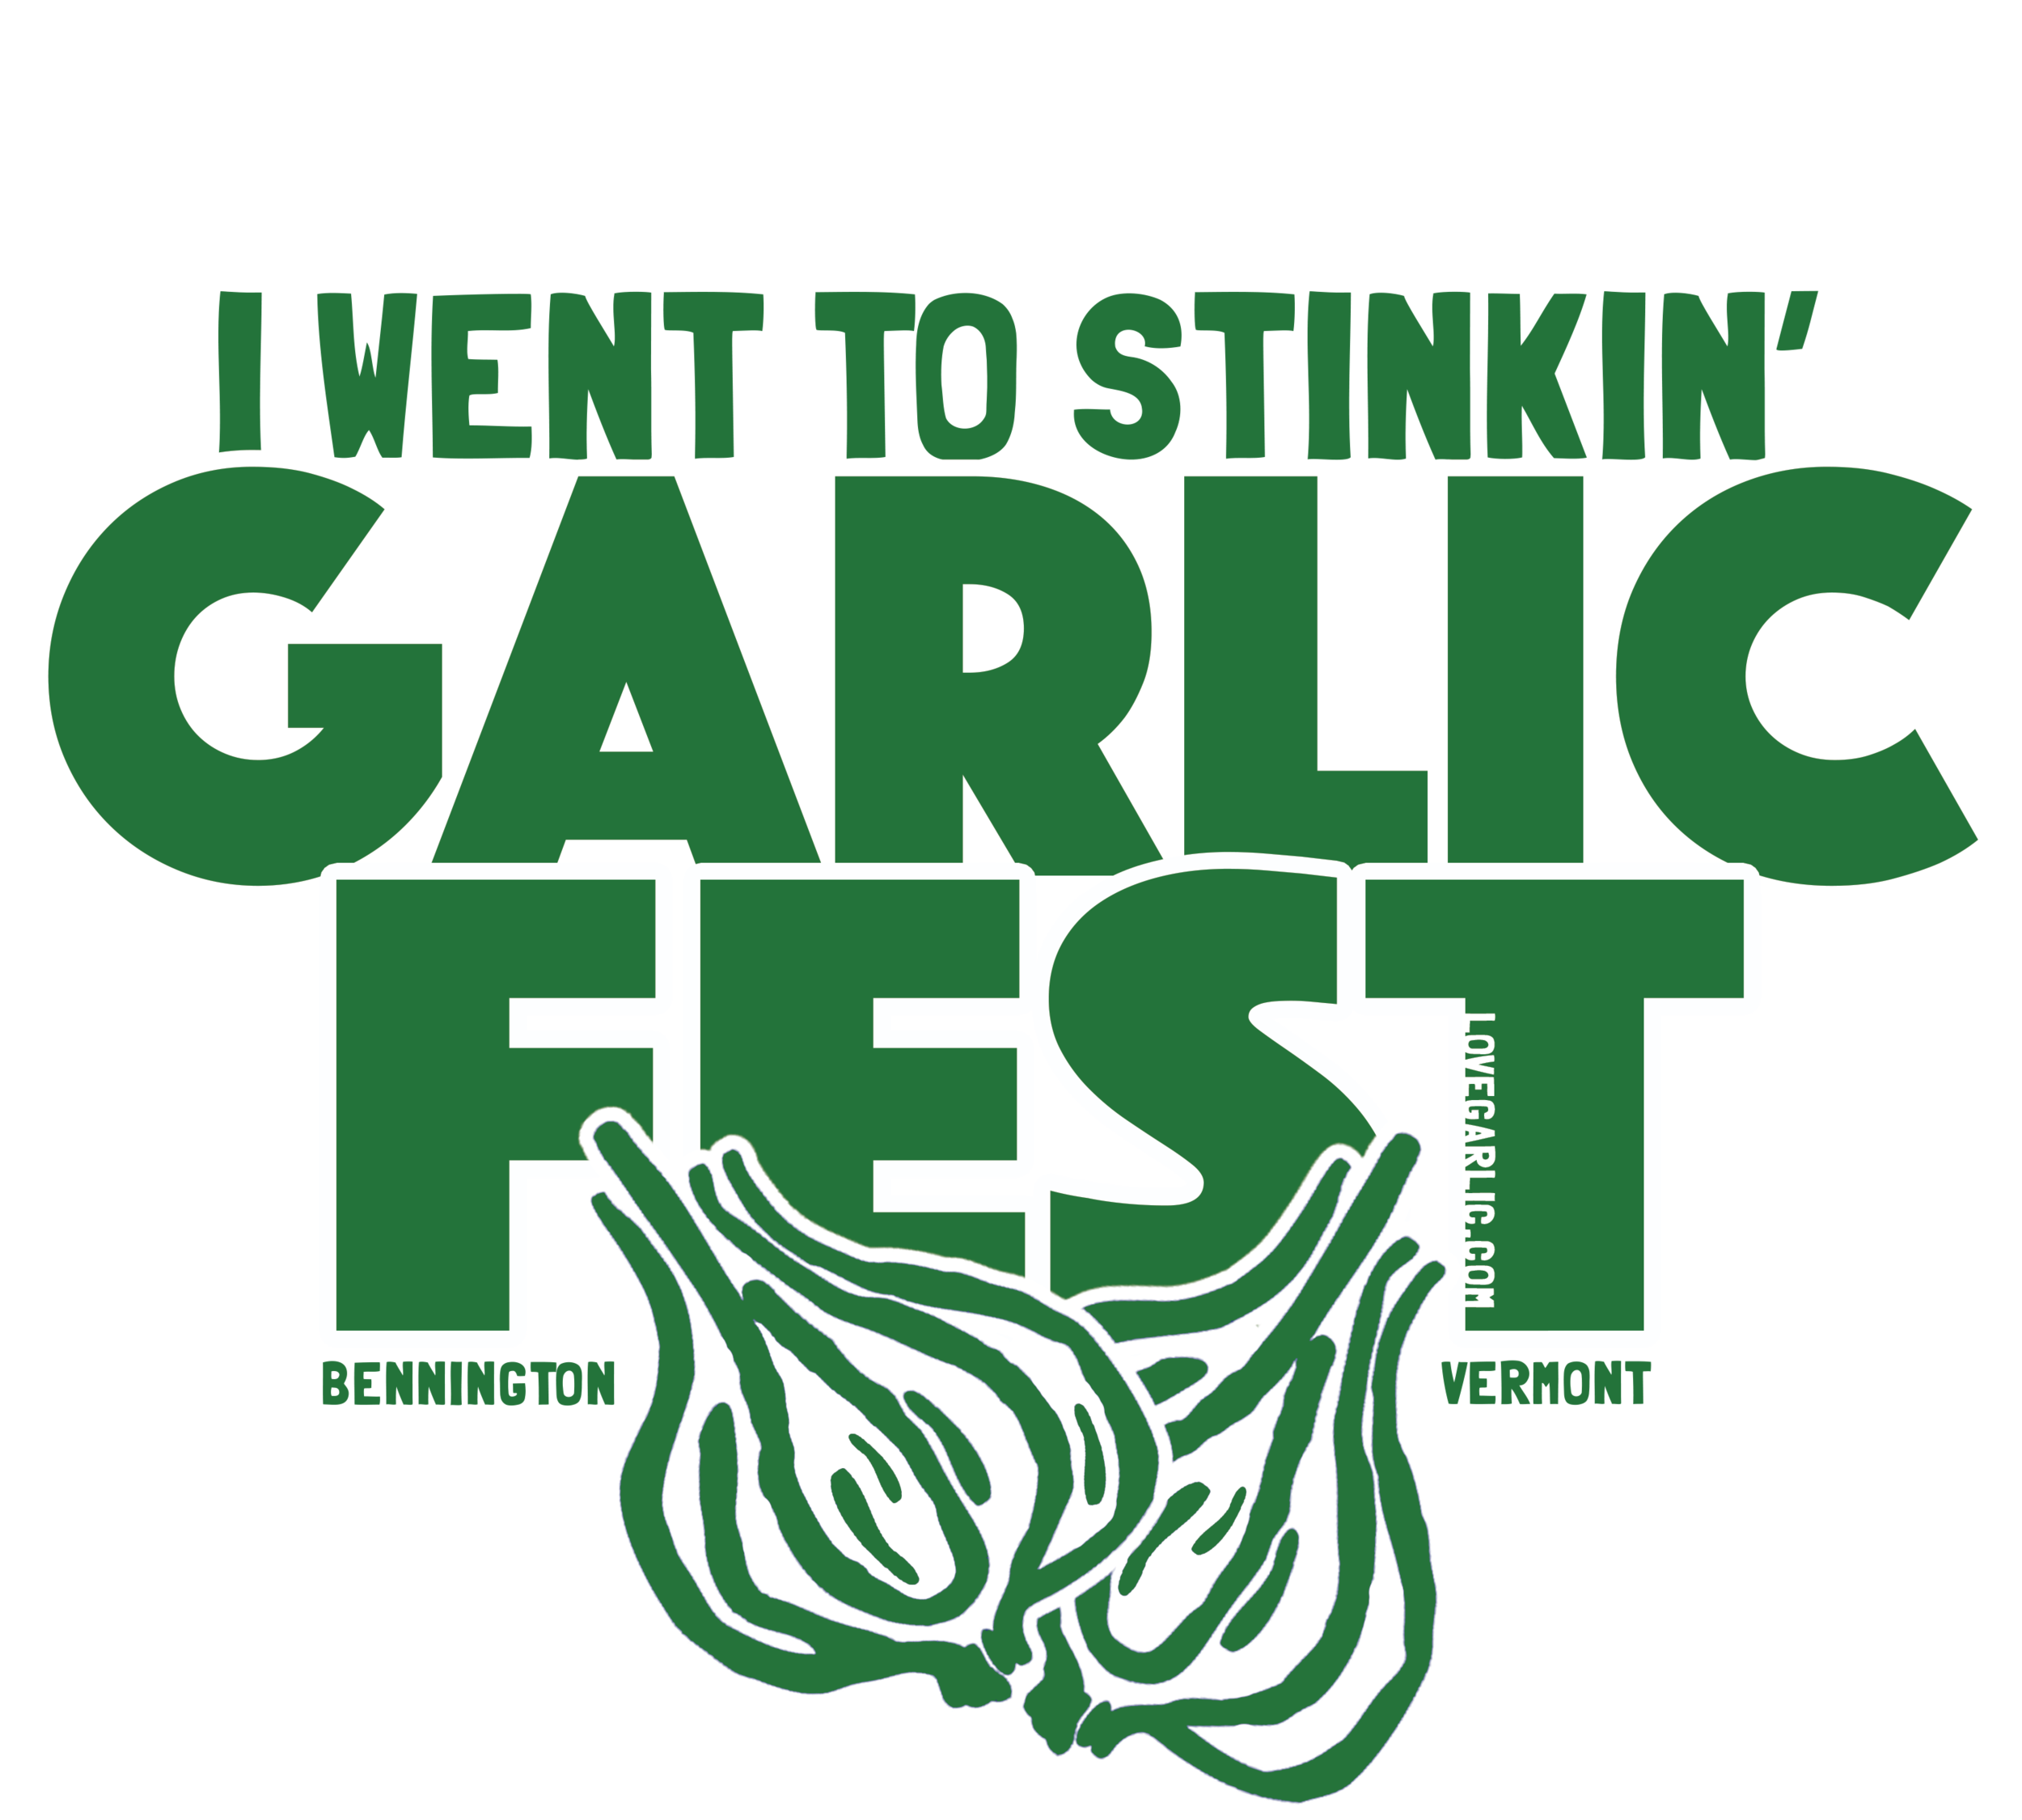 GF-I-Went-To-Stinkin-GF-2017-Shirt-green.png